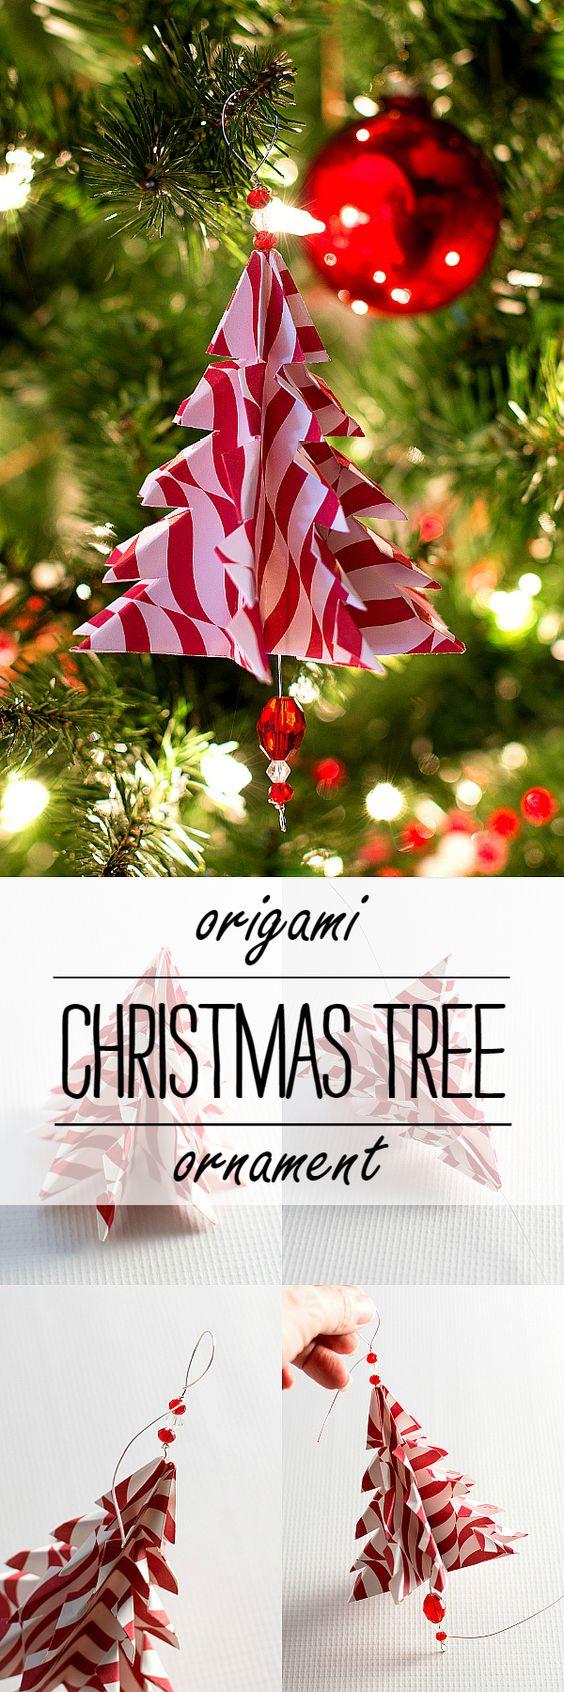 Handmade christmas tree ornaments ideas - Christmas Craft Ideas Handmade Ornament From Paper